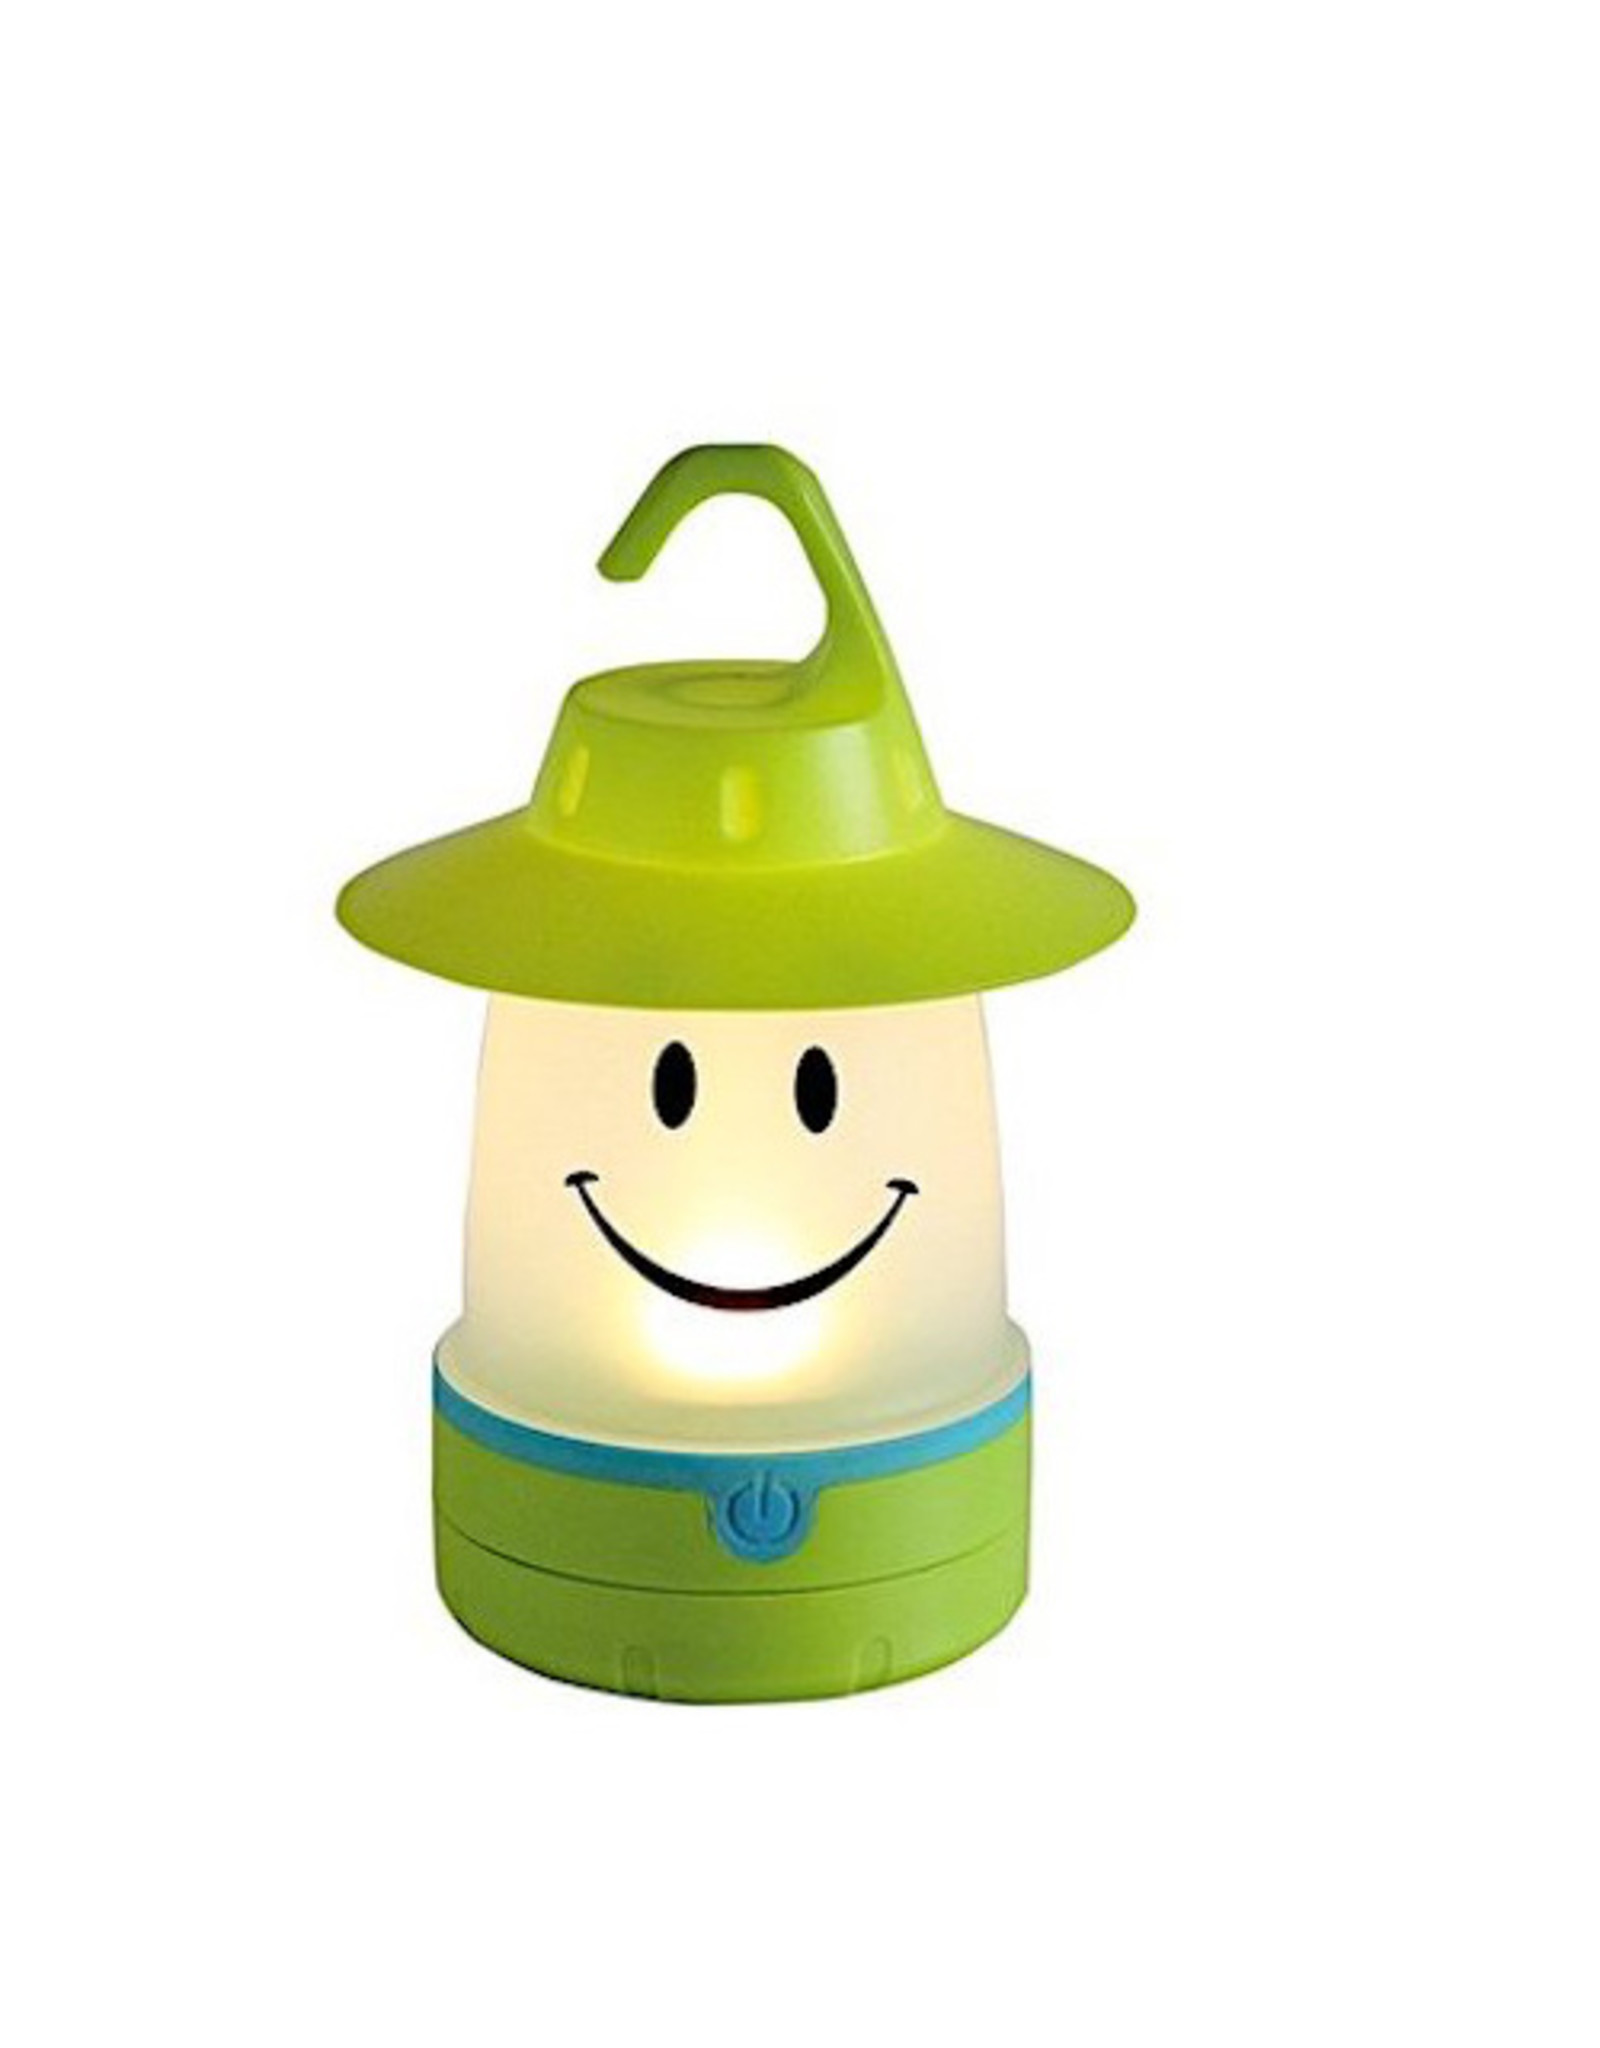 Time Concepts Smile Soft LED Lantern